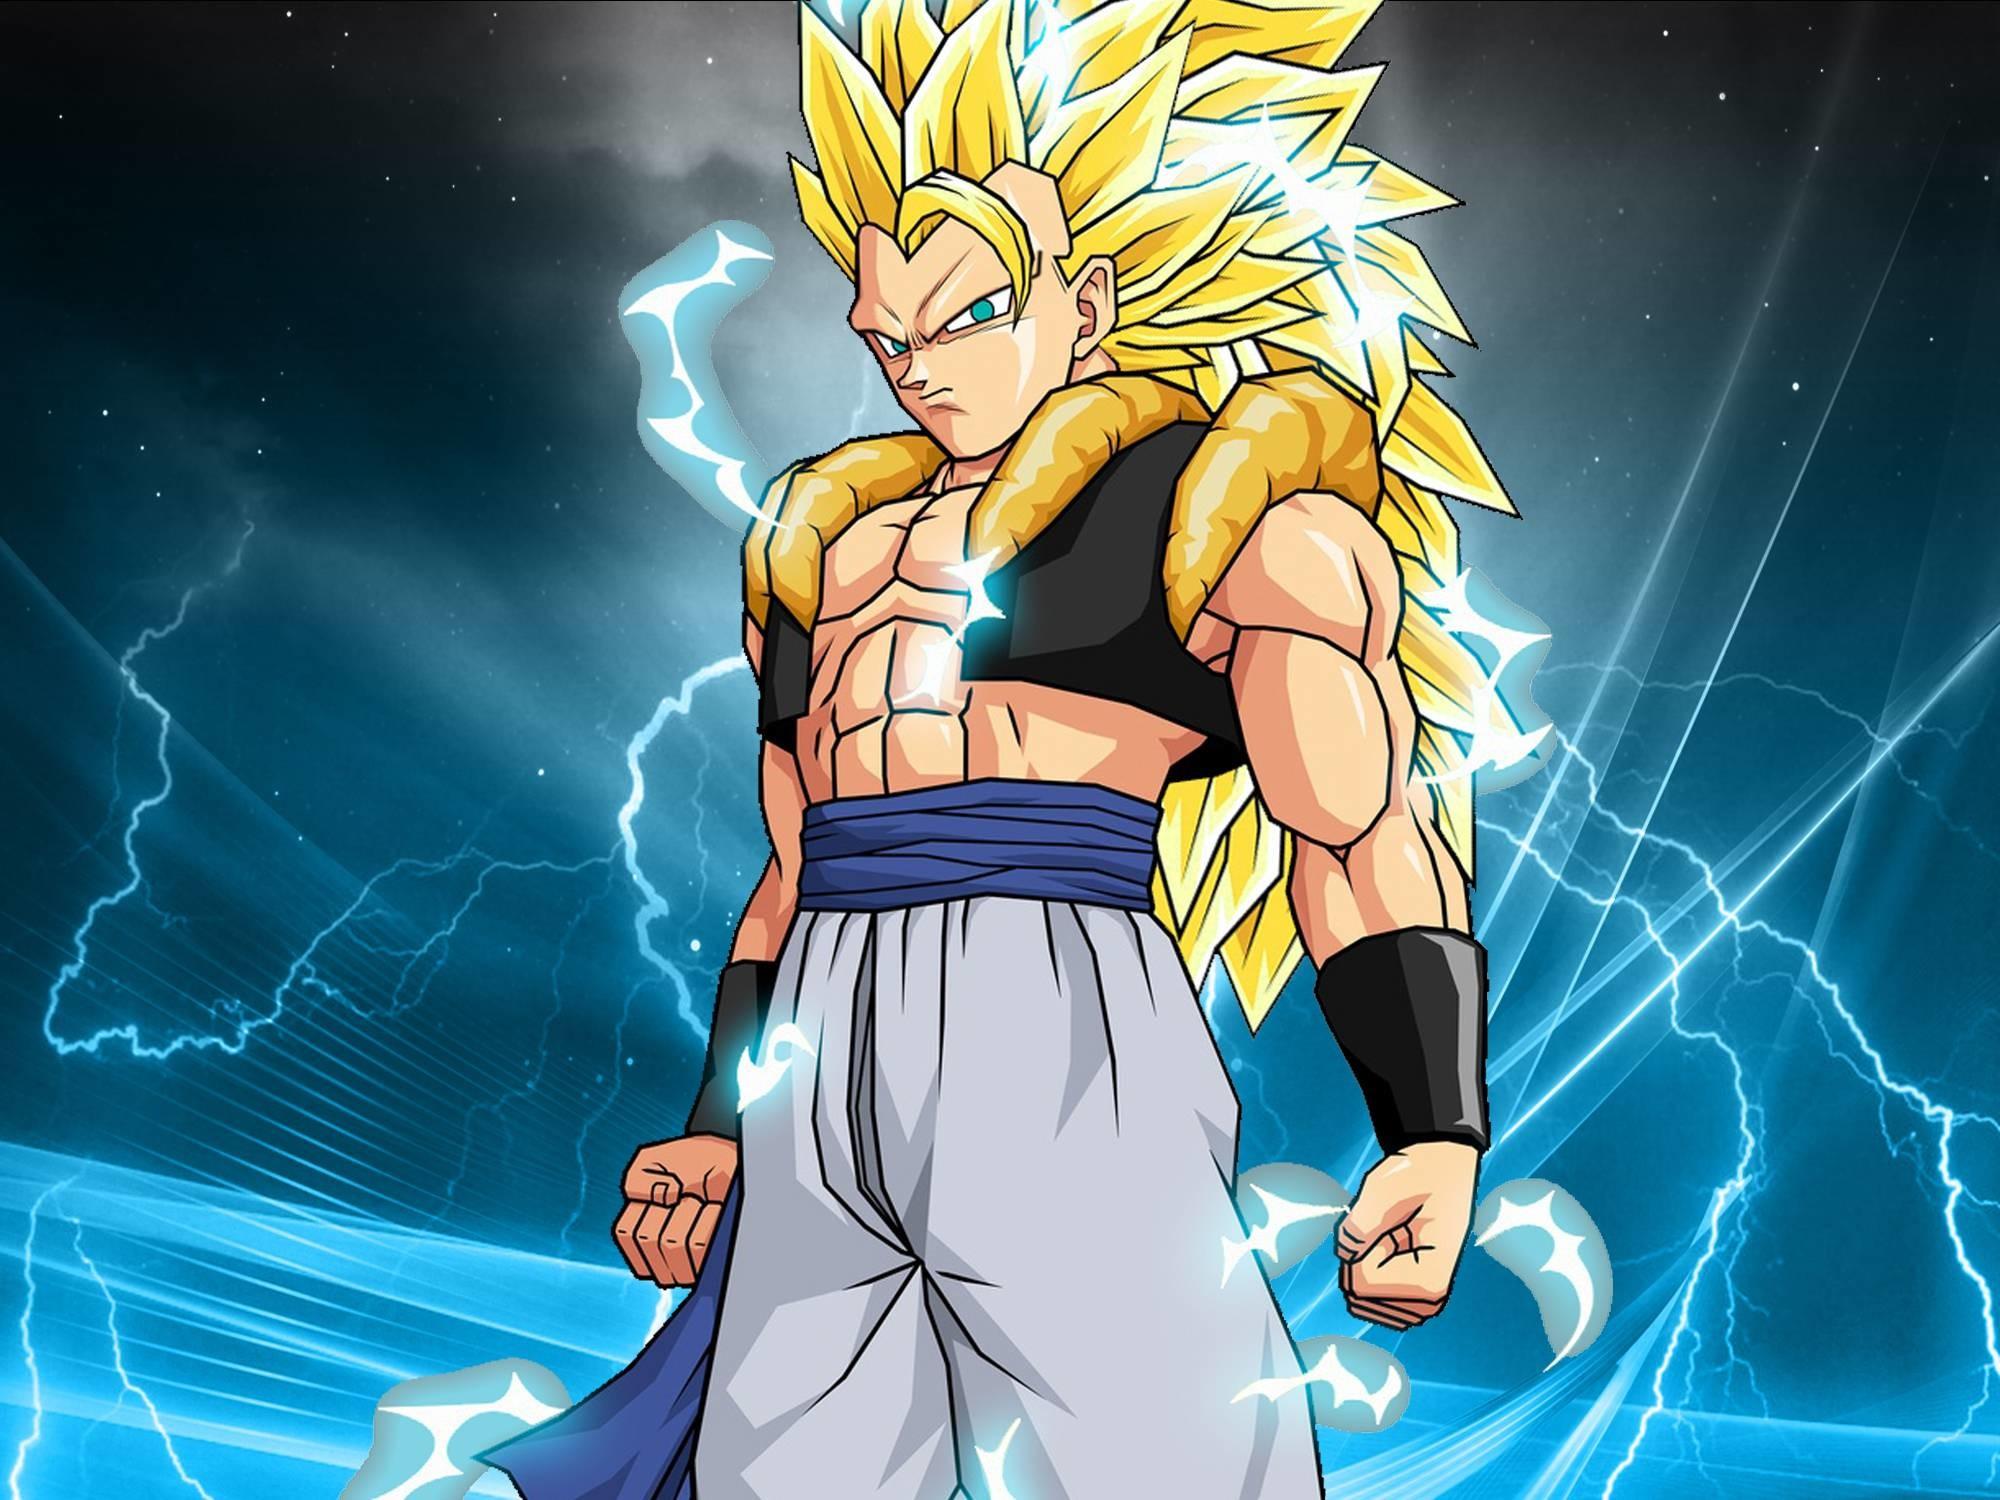 Dragon Ball Z Wallpaper Goku Super Saiyan God Wallpapers HD .